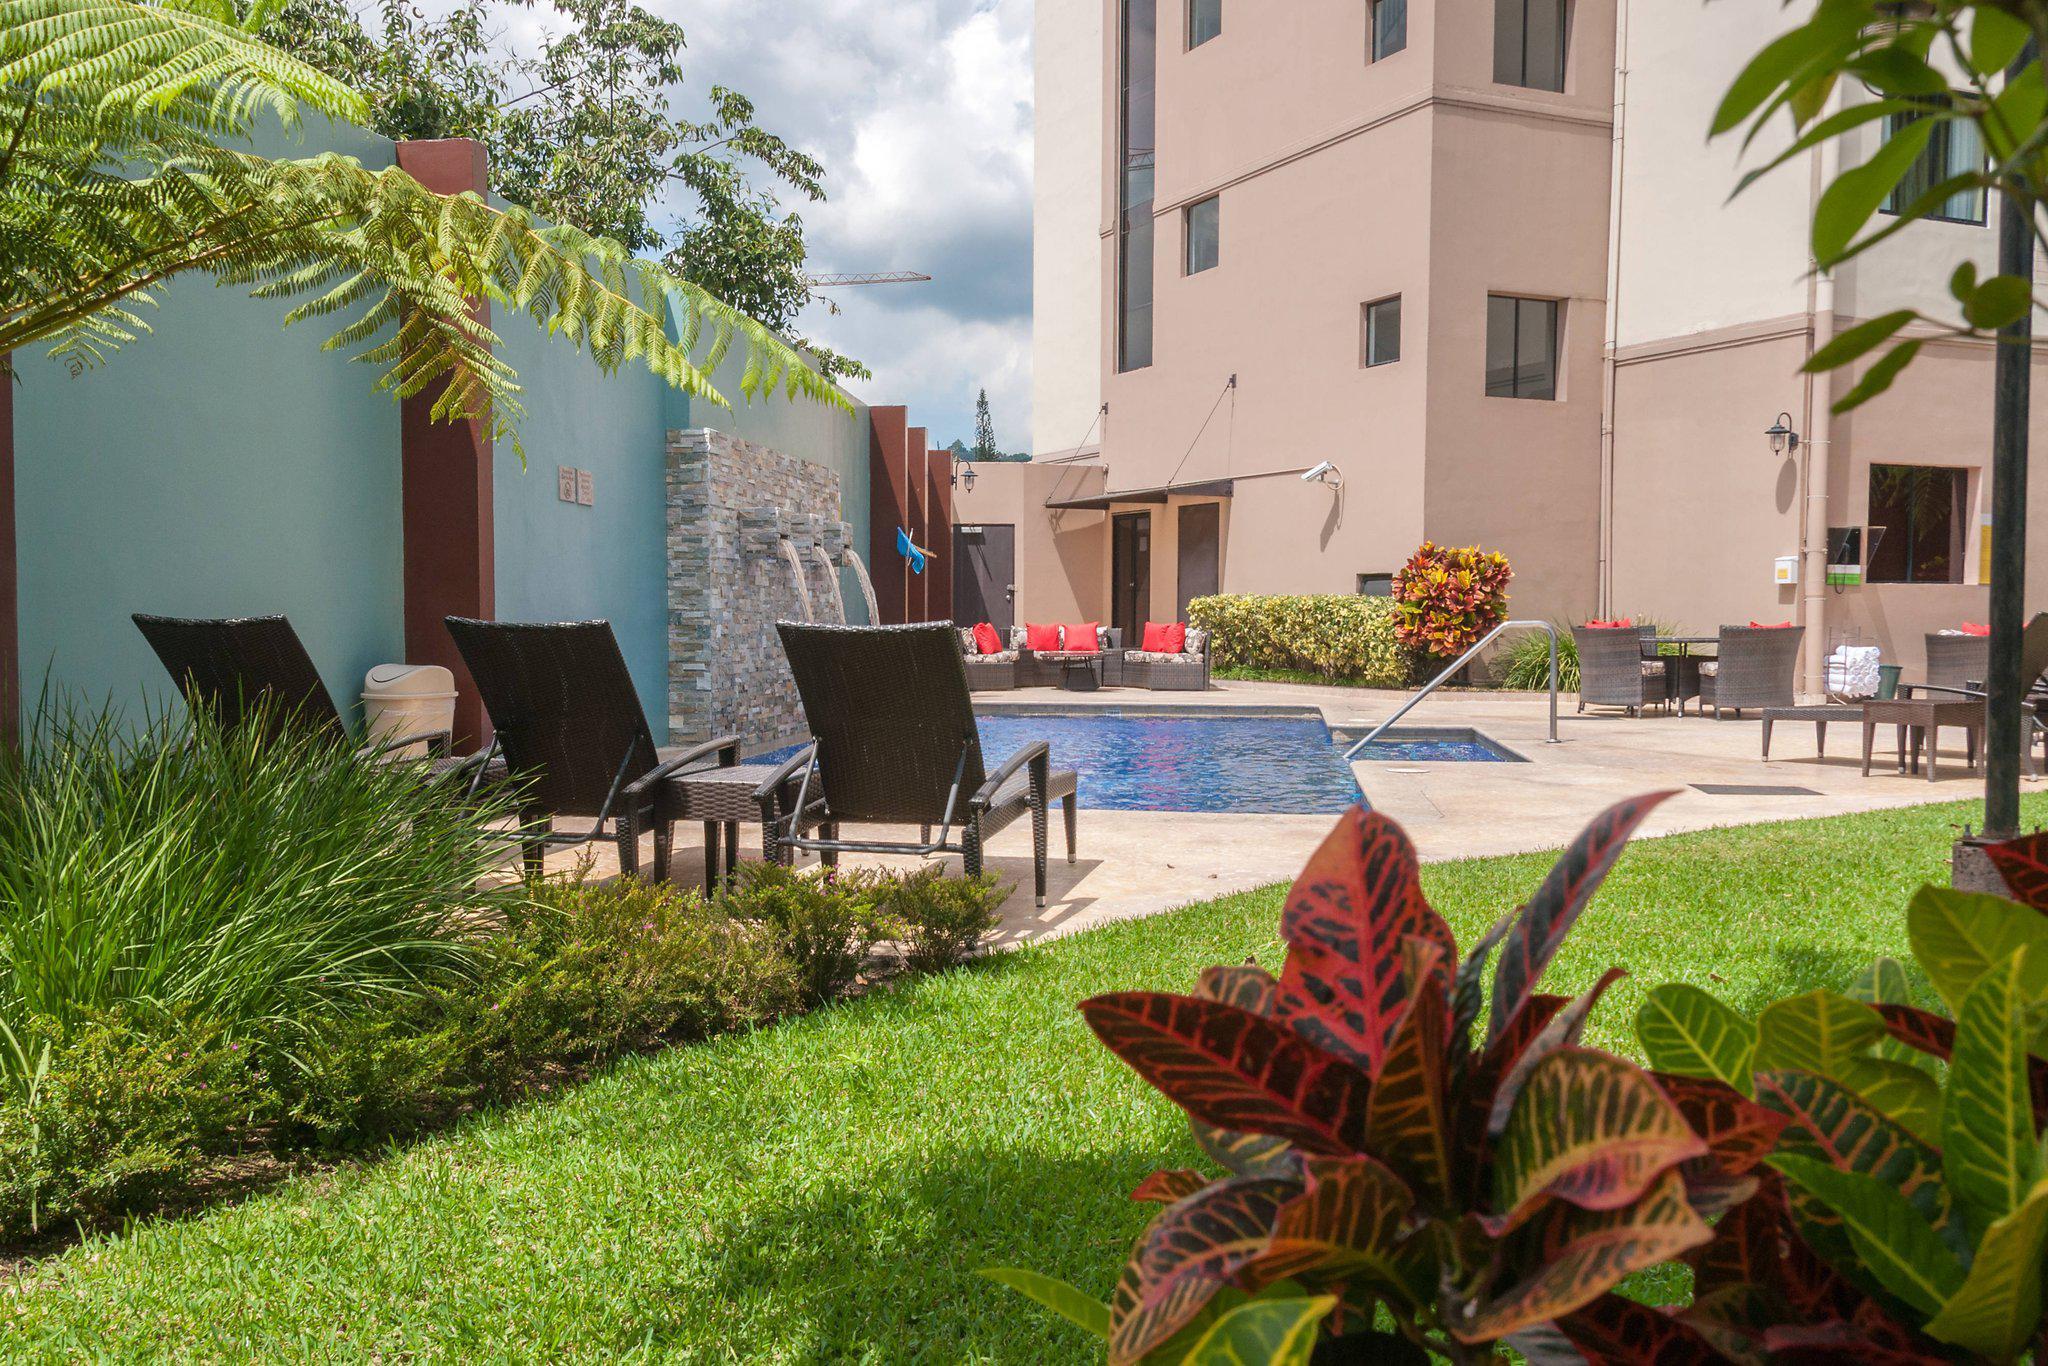 Courtyard by Marriott San Salvador